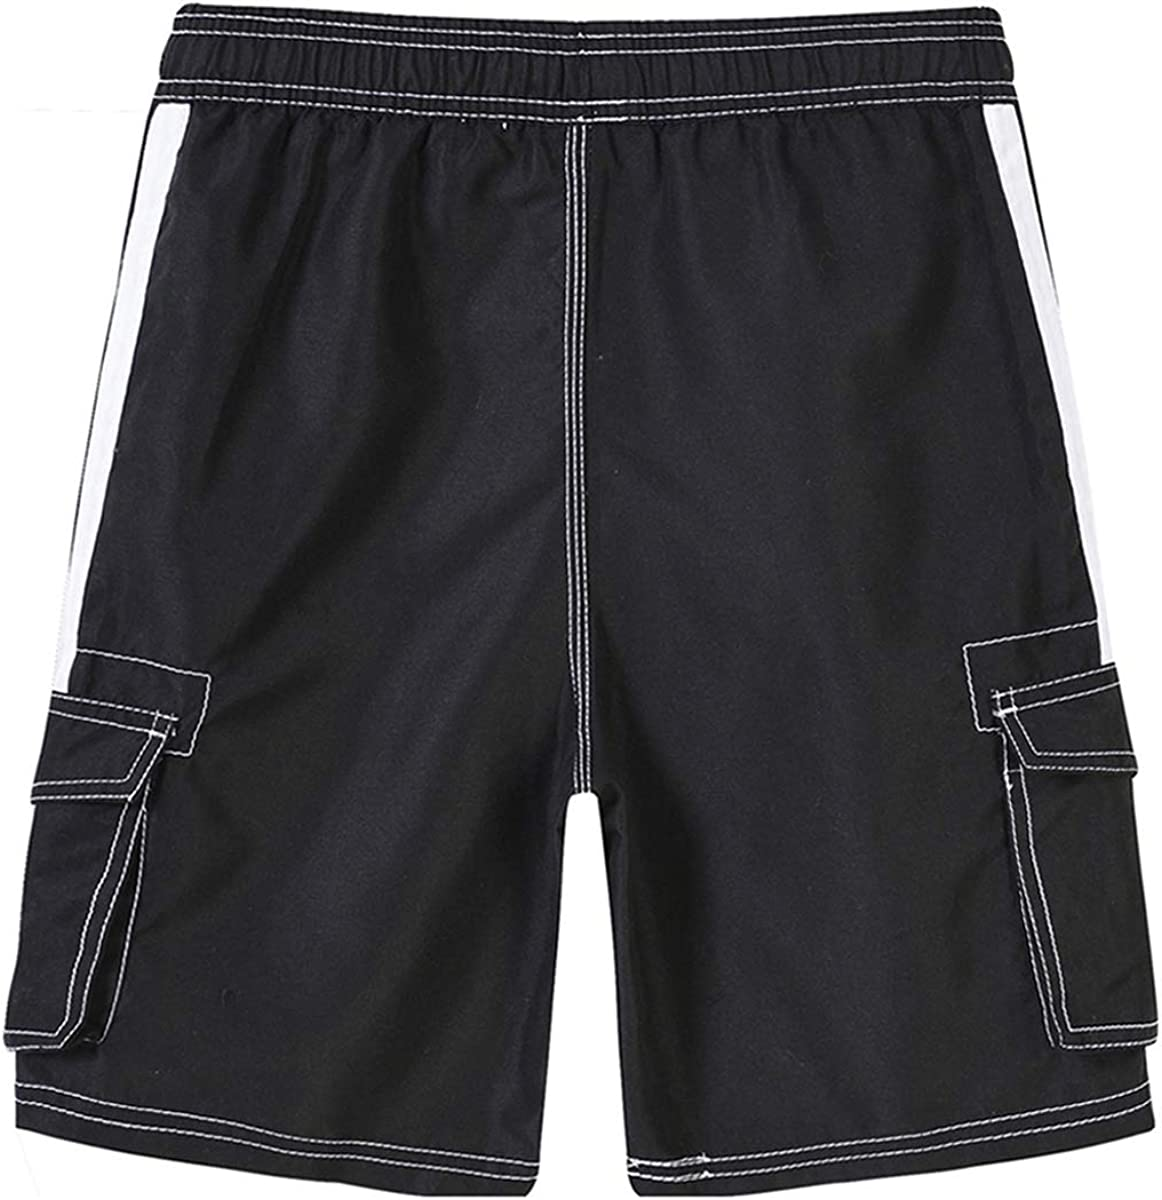 Akula Boys Quick Dry Swim Trunks Beach Board Shorts with Mesh Lining